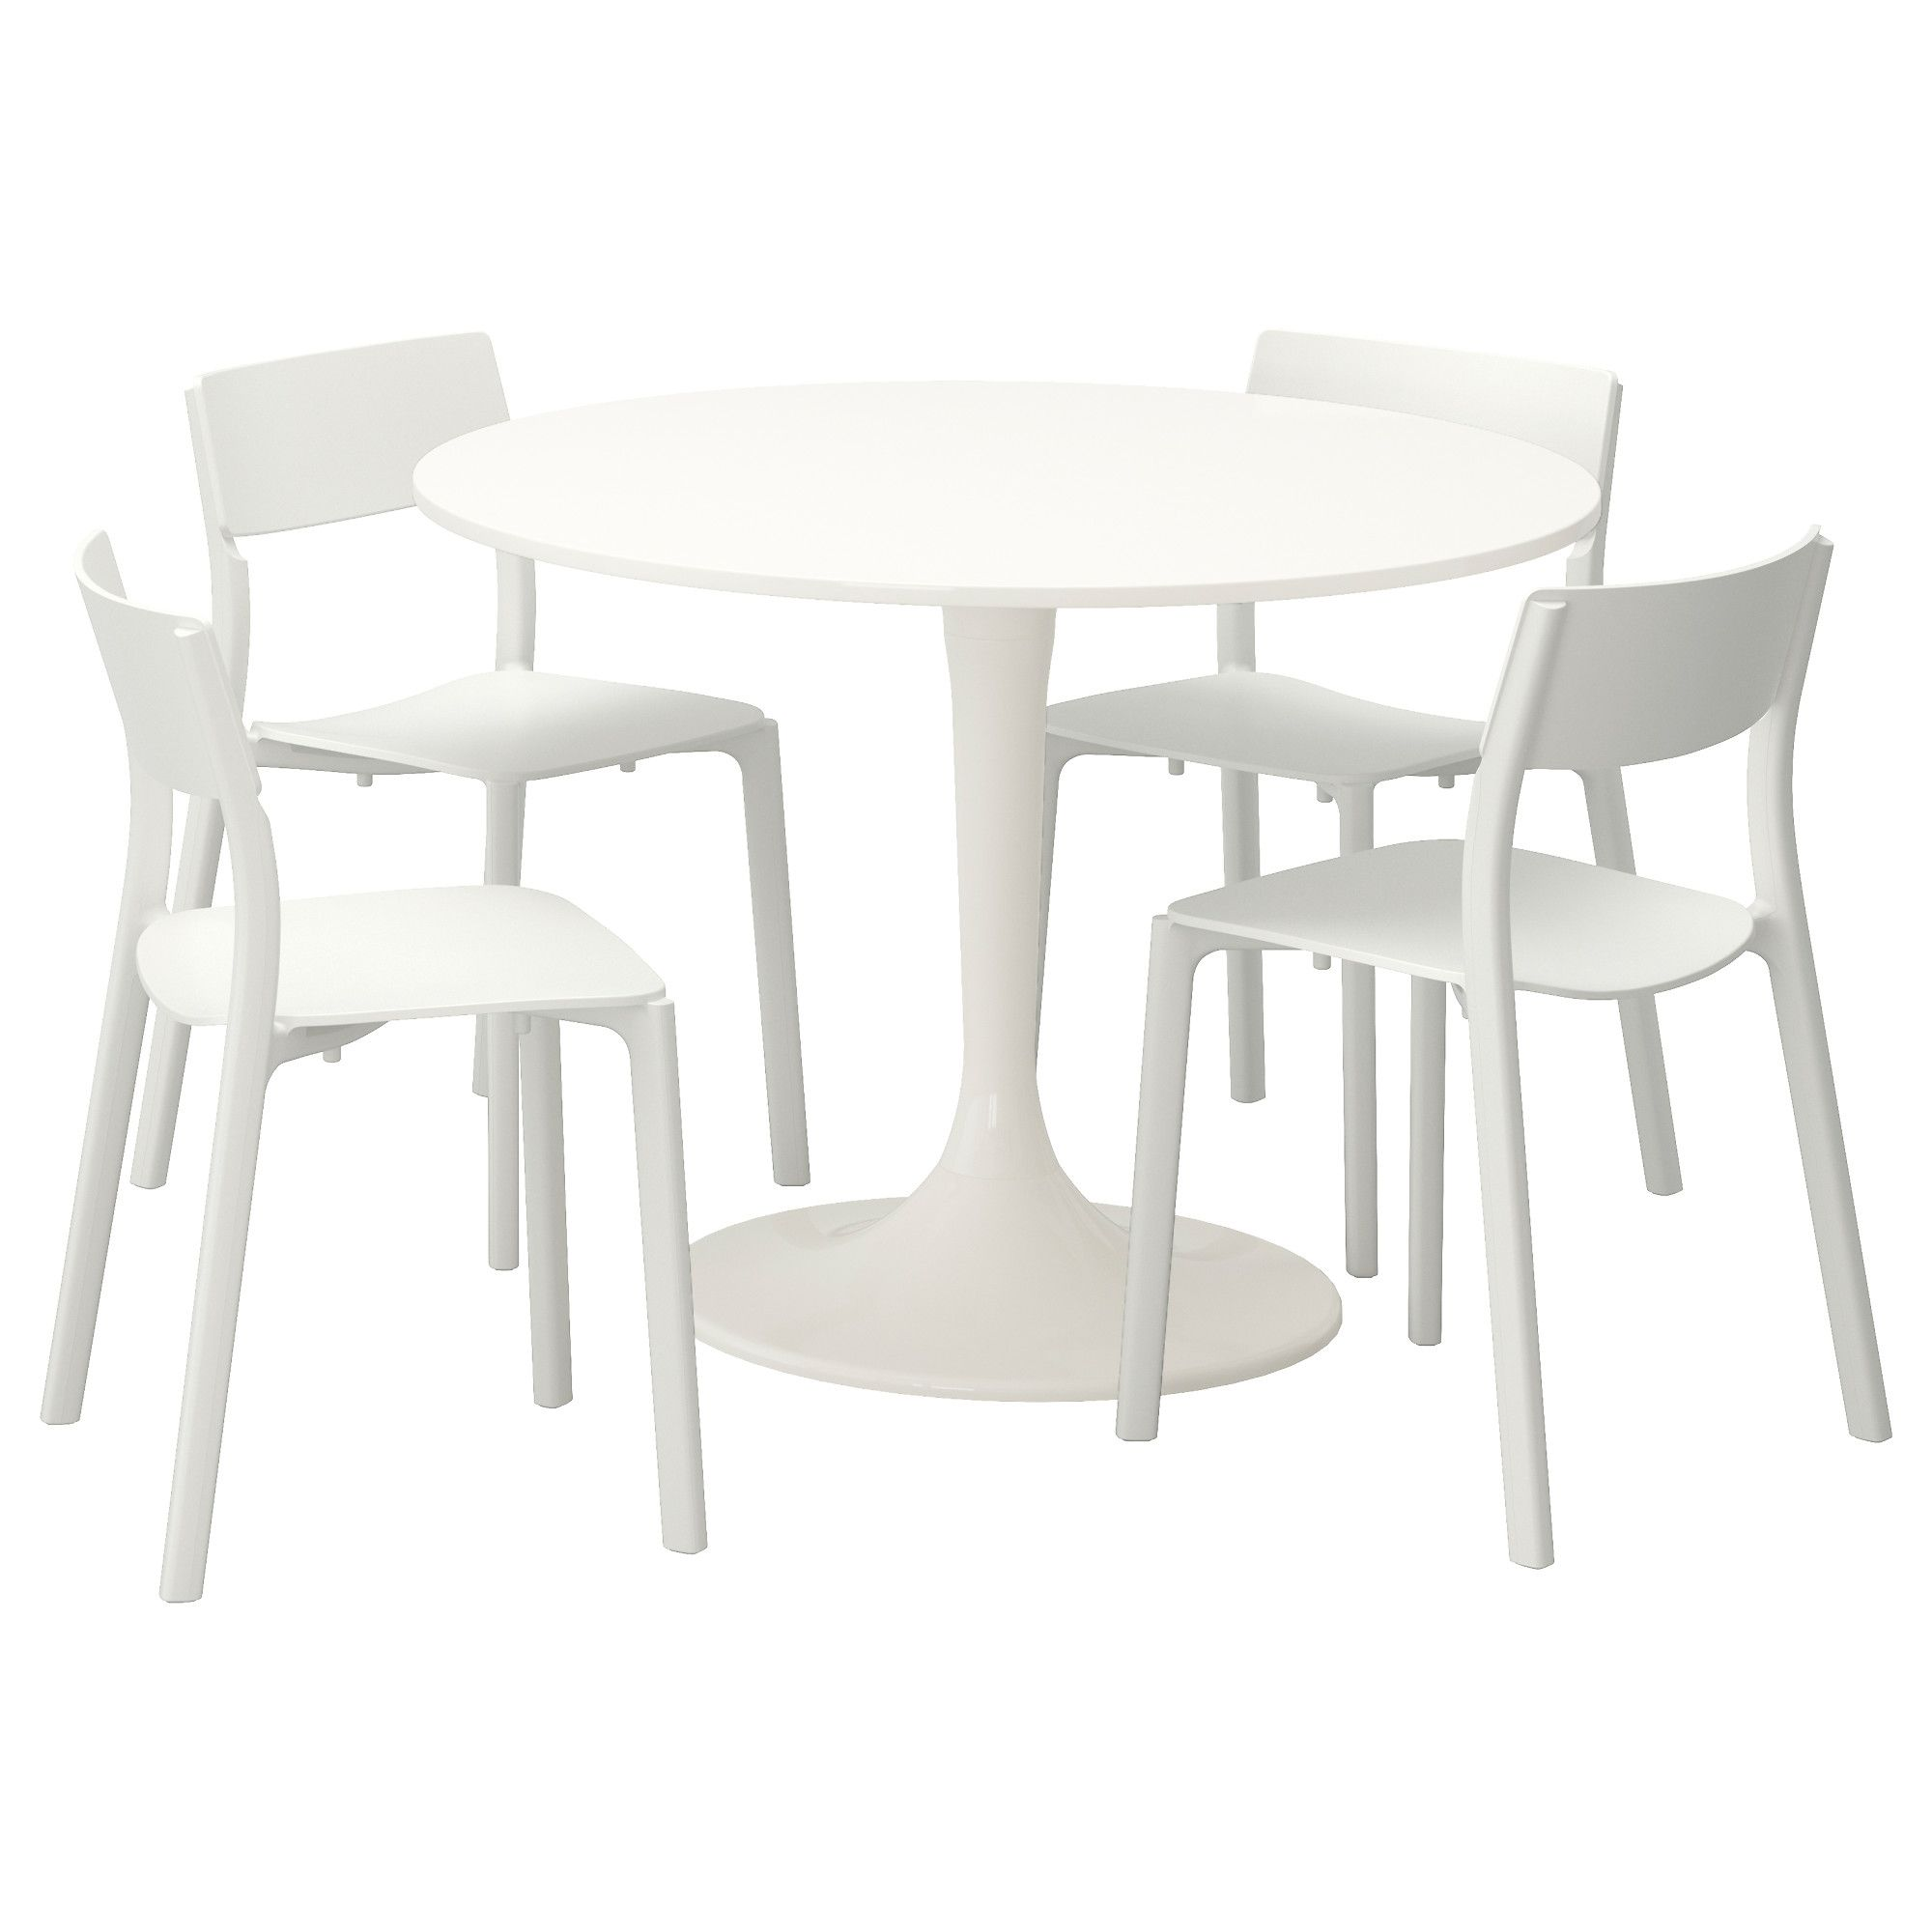 IKEA - DOCKSTA / JANINGE Table and 4 chairs white, white